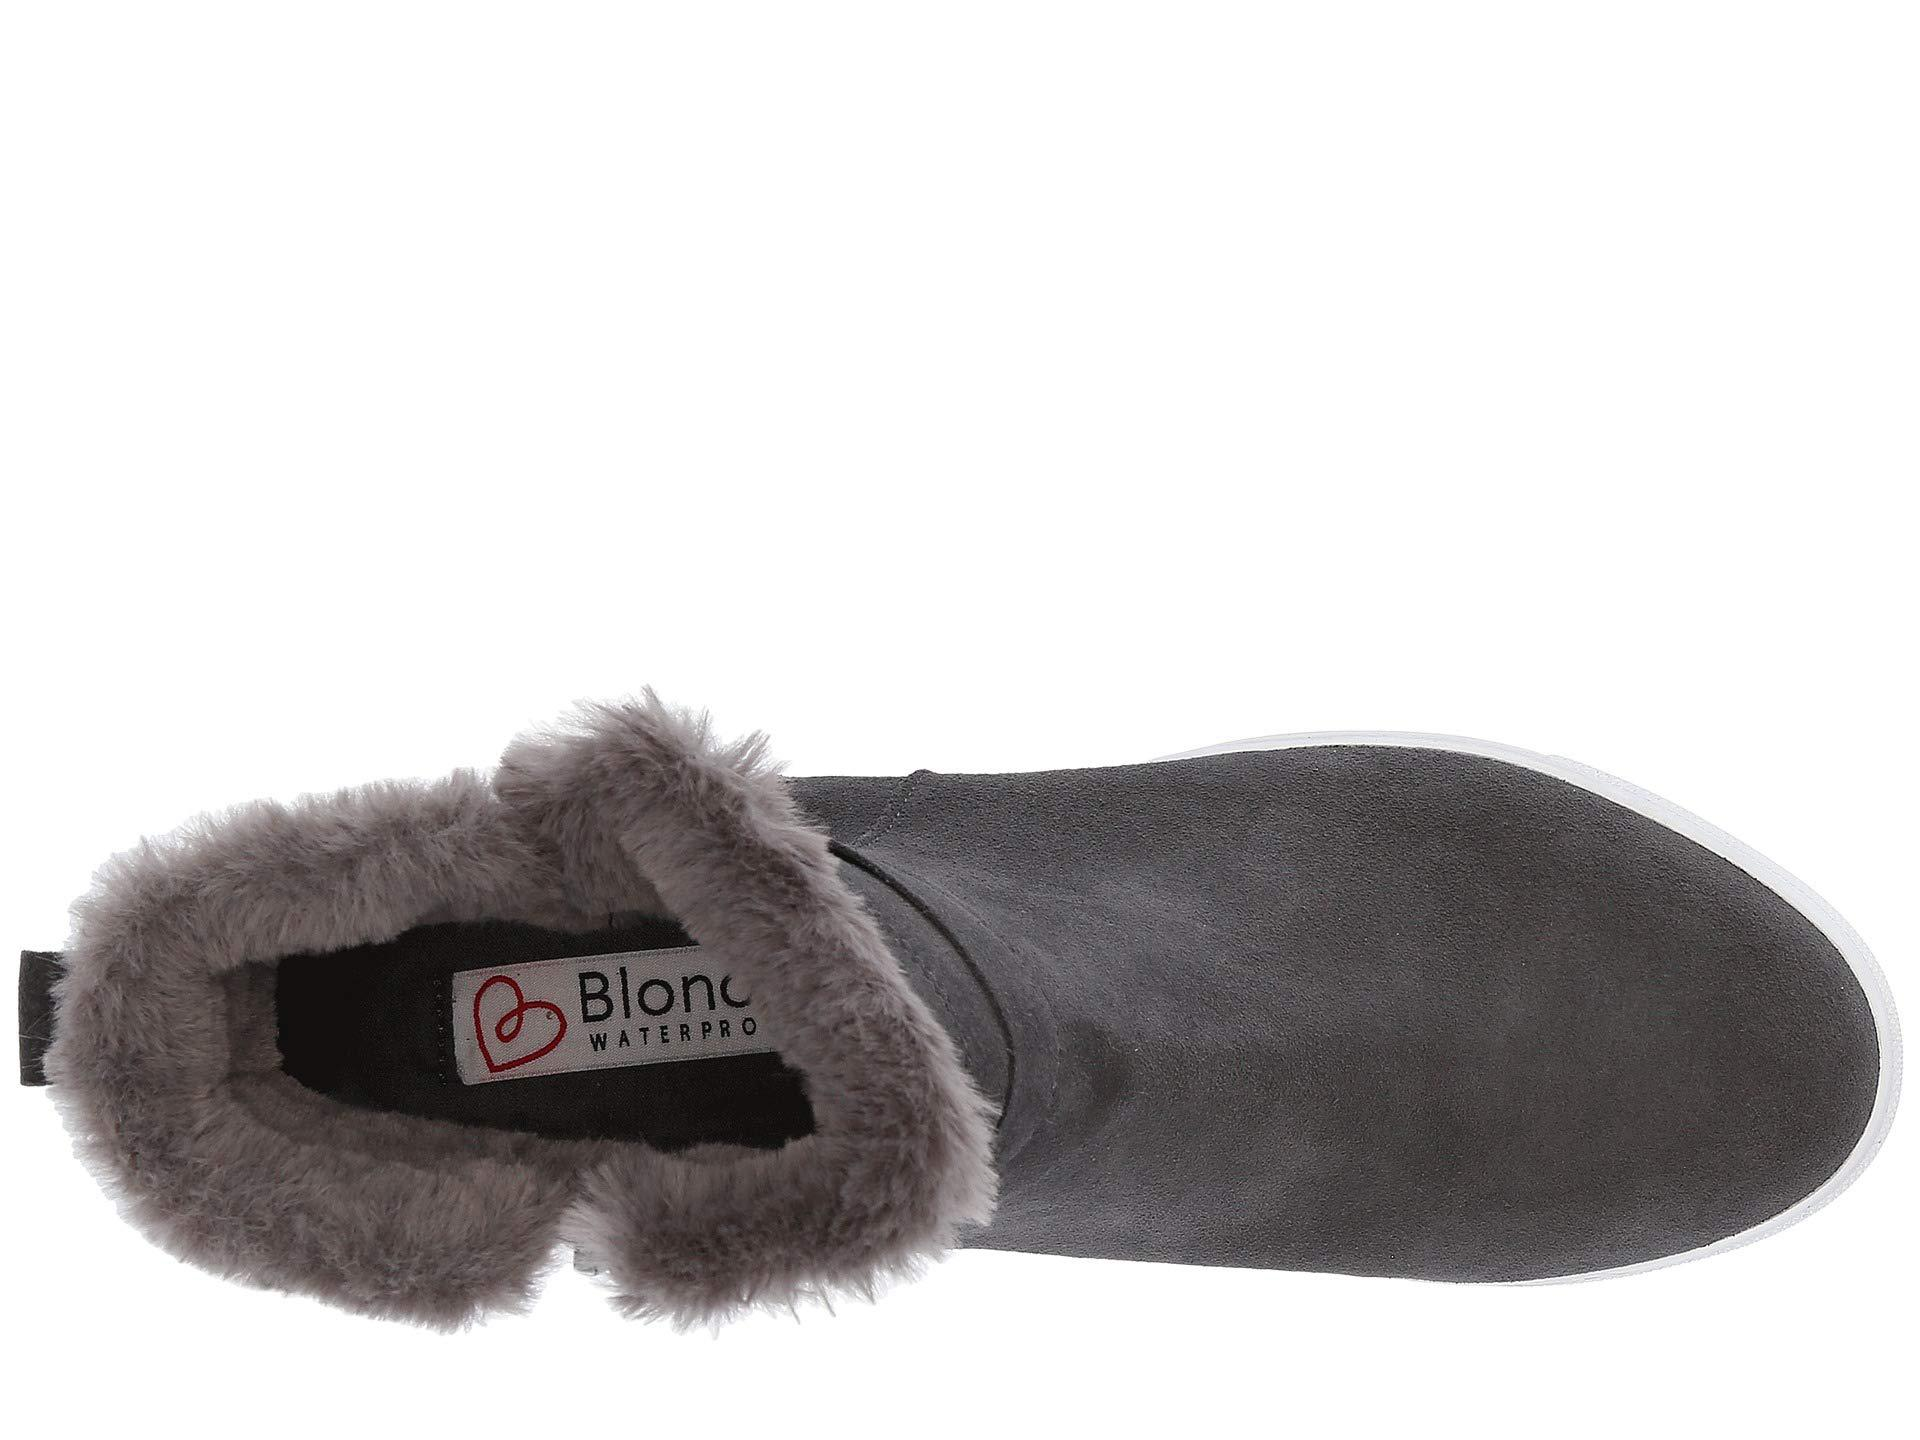 82dc2fd75cb2 Lyst - Blondo Glade Waterproof (dark Grey Suede) Women s Shoes in Gray